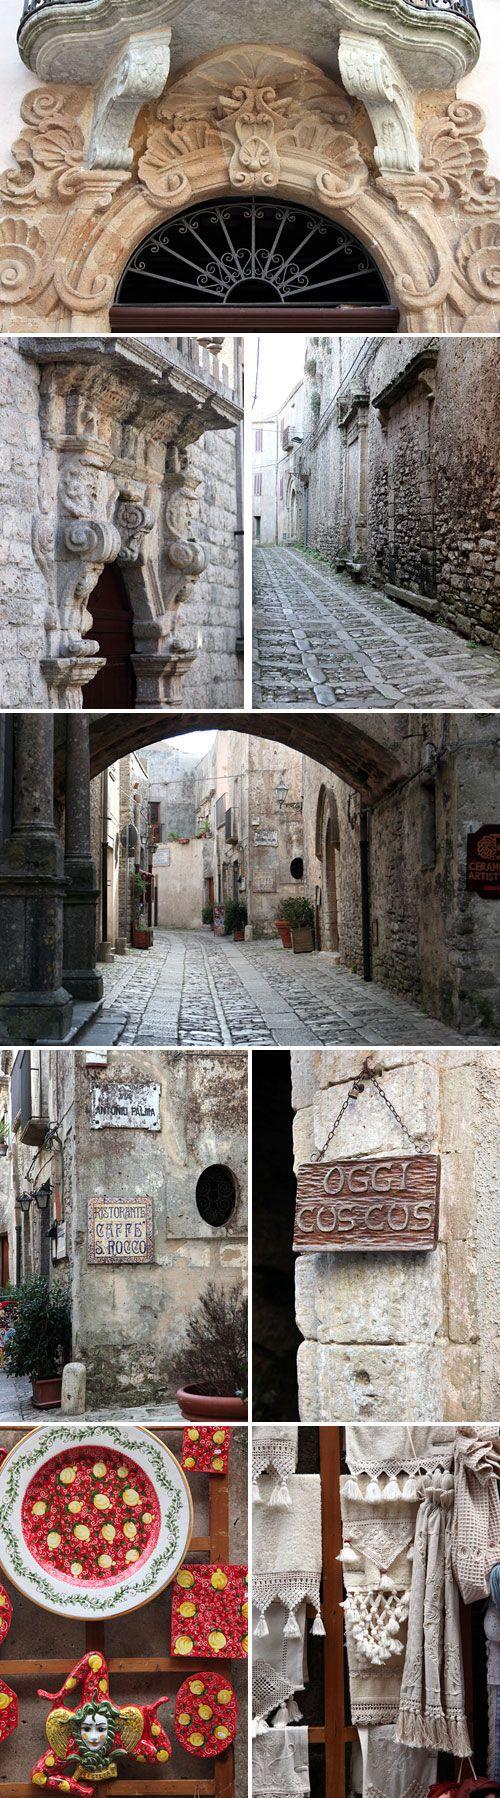 Erice, Sicily